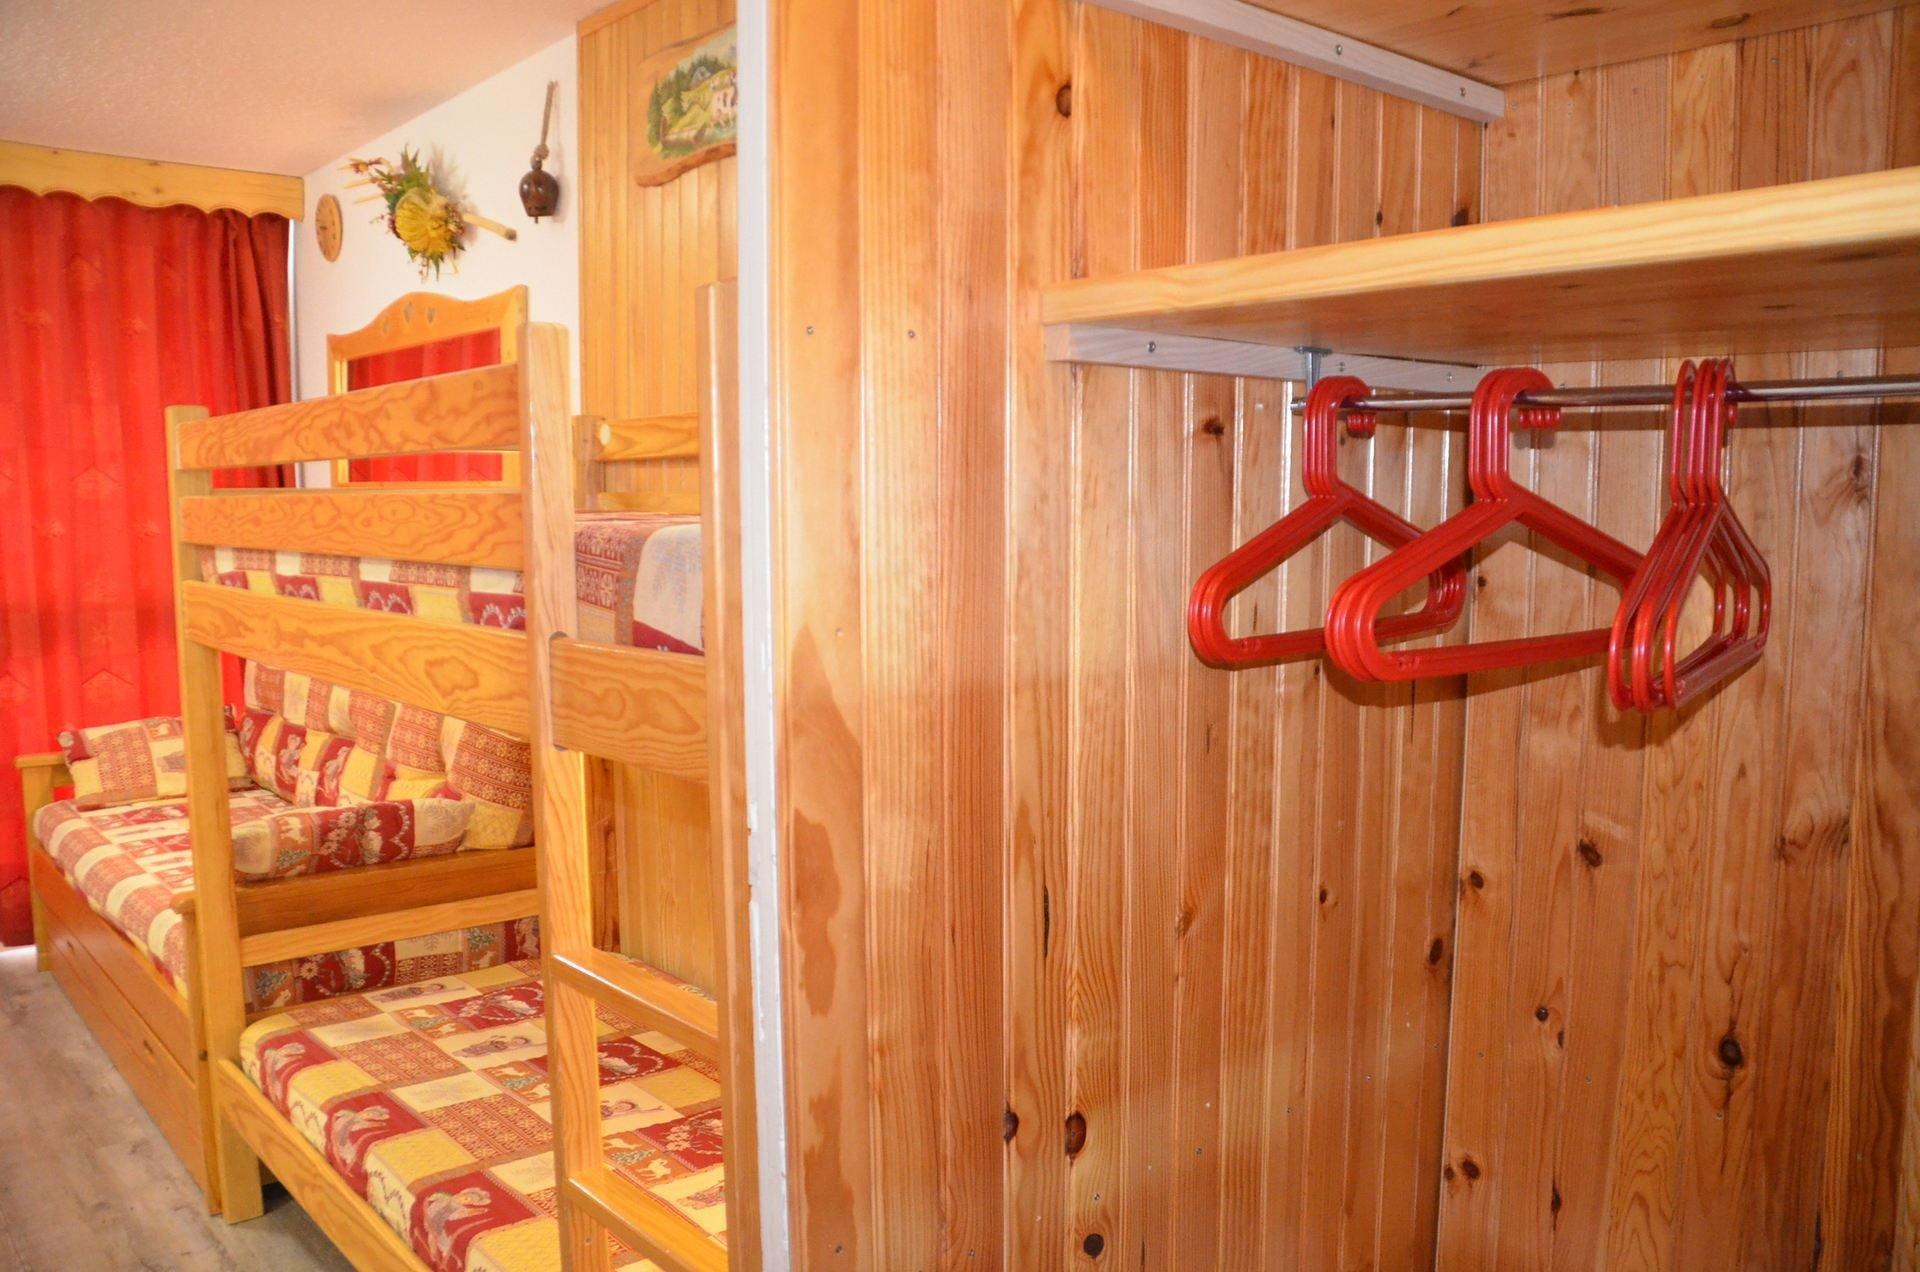 3 Pers Studio ski-in ski-out / CHERFERIE 805